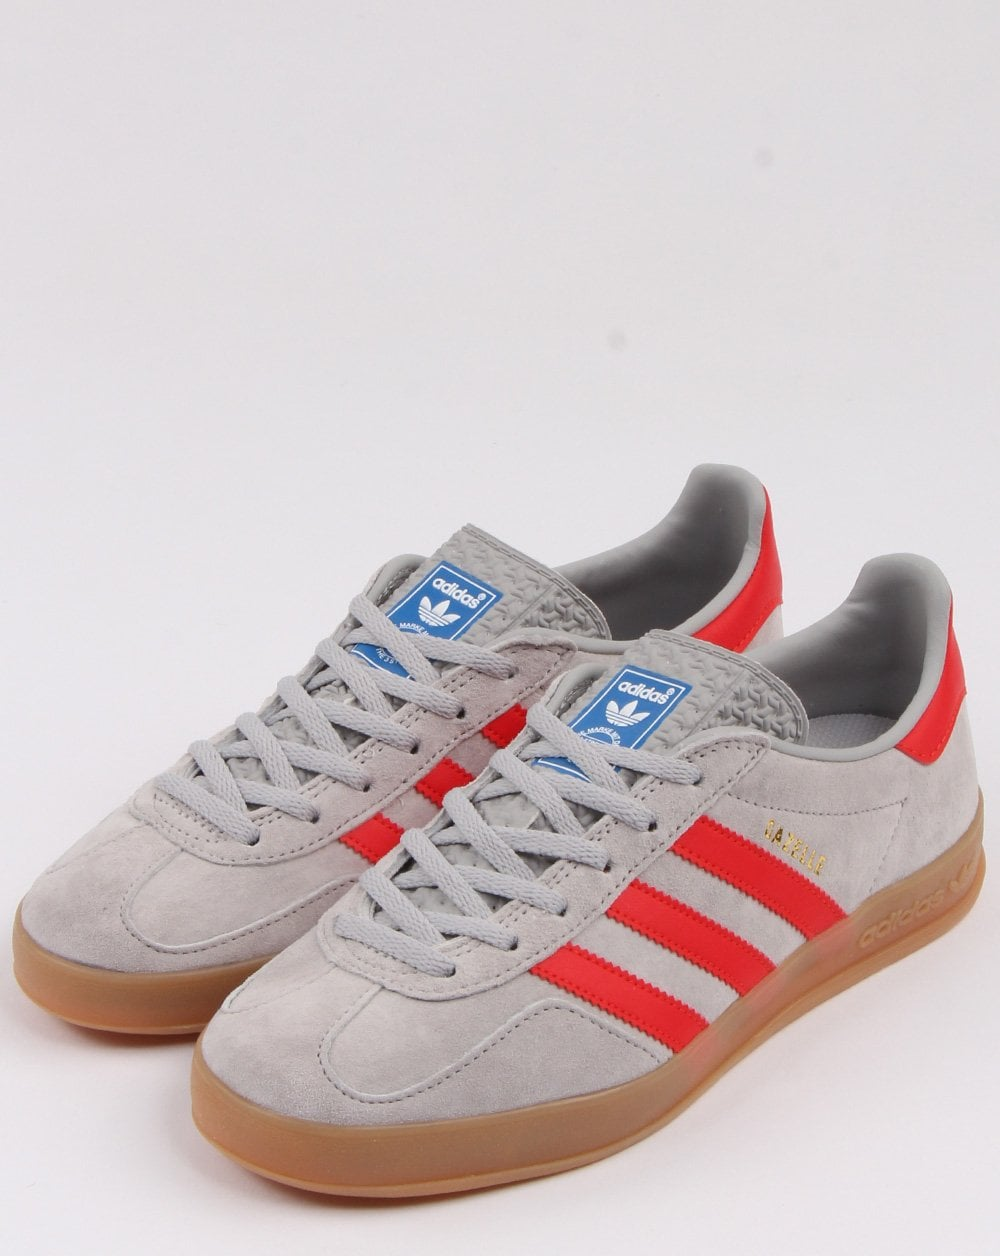 Adidas Gazelle Indoor Trainers Grey/red